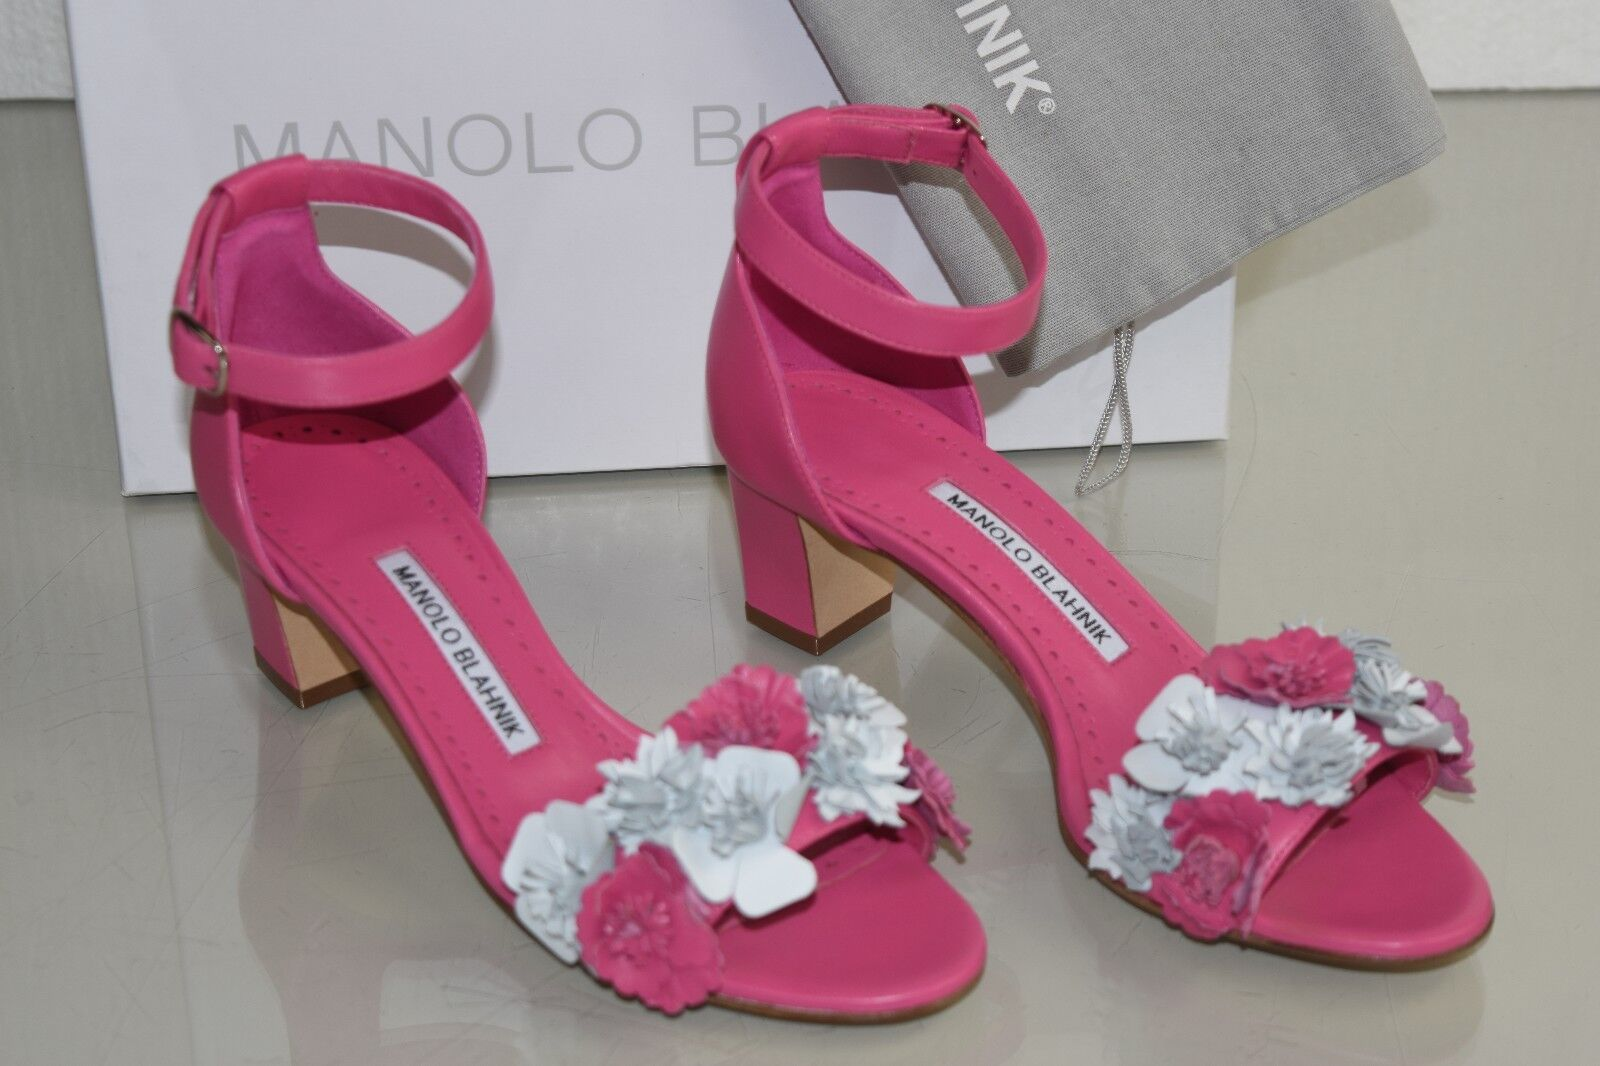 895 New Manolo Blahnik Laurfior 50 Pink Flower Floral Sandals shoes 36 40.5